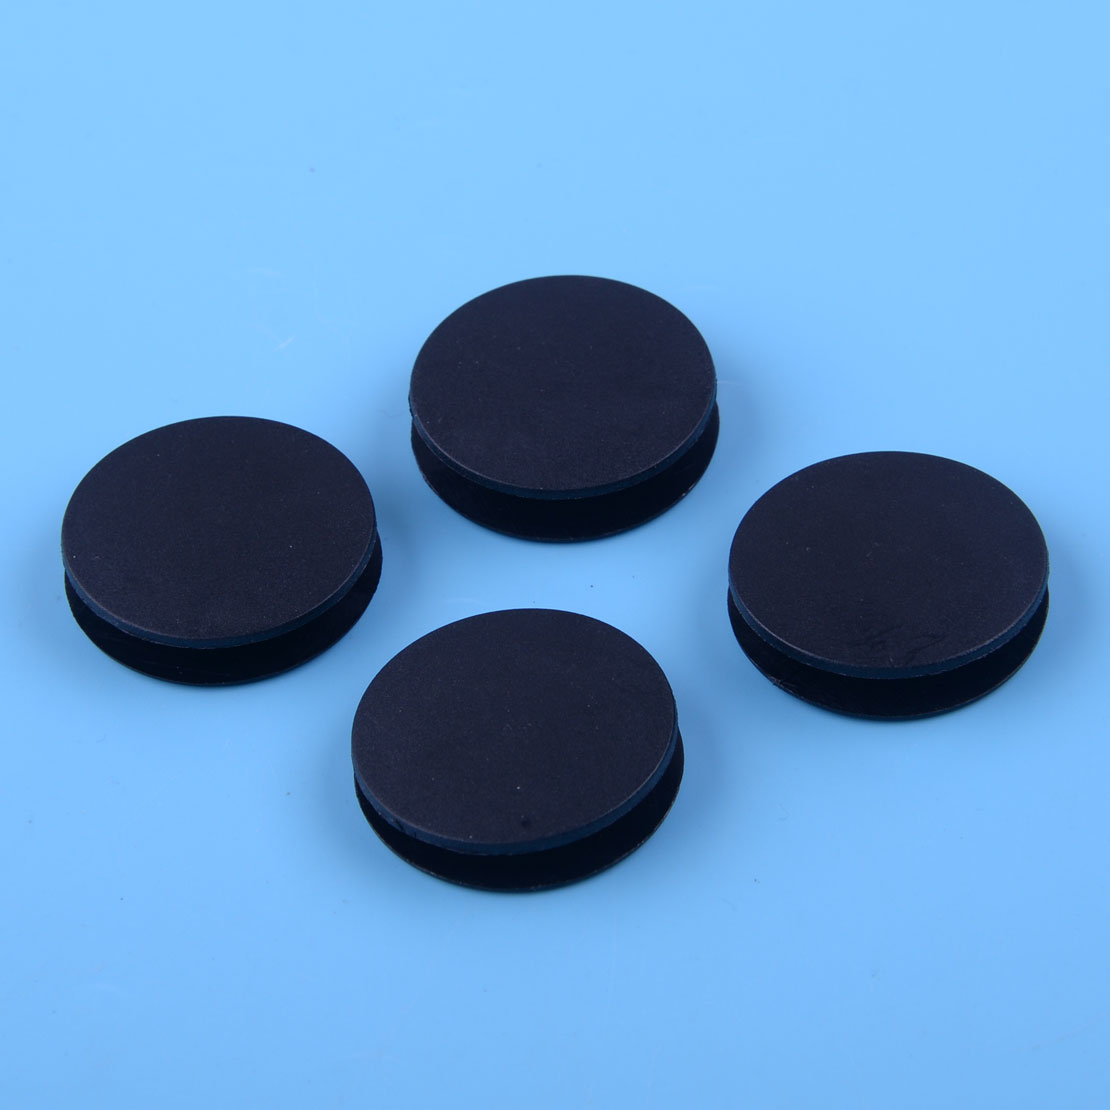 DWCX 4Pcs Accessories Car Mat Grips Carpet Floor Fixing Clips Clamps Cap 3.6 cm Black Plastic Fit for MERCEDES-BENZ BQ6680520